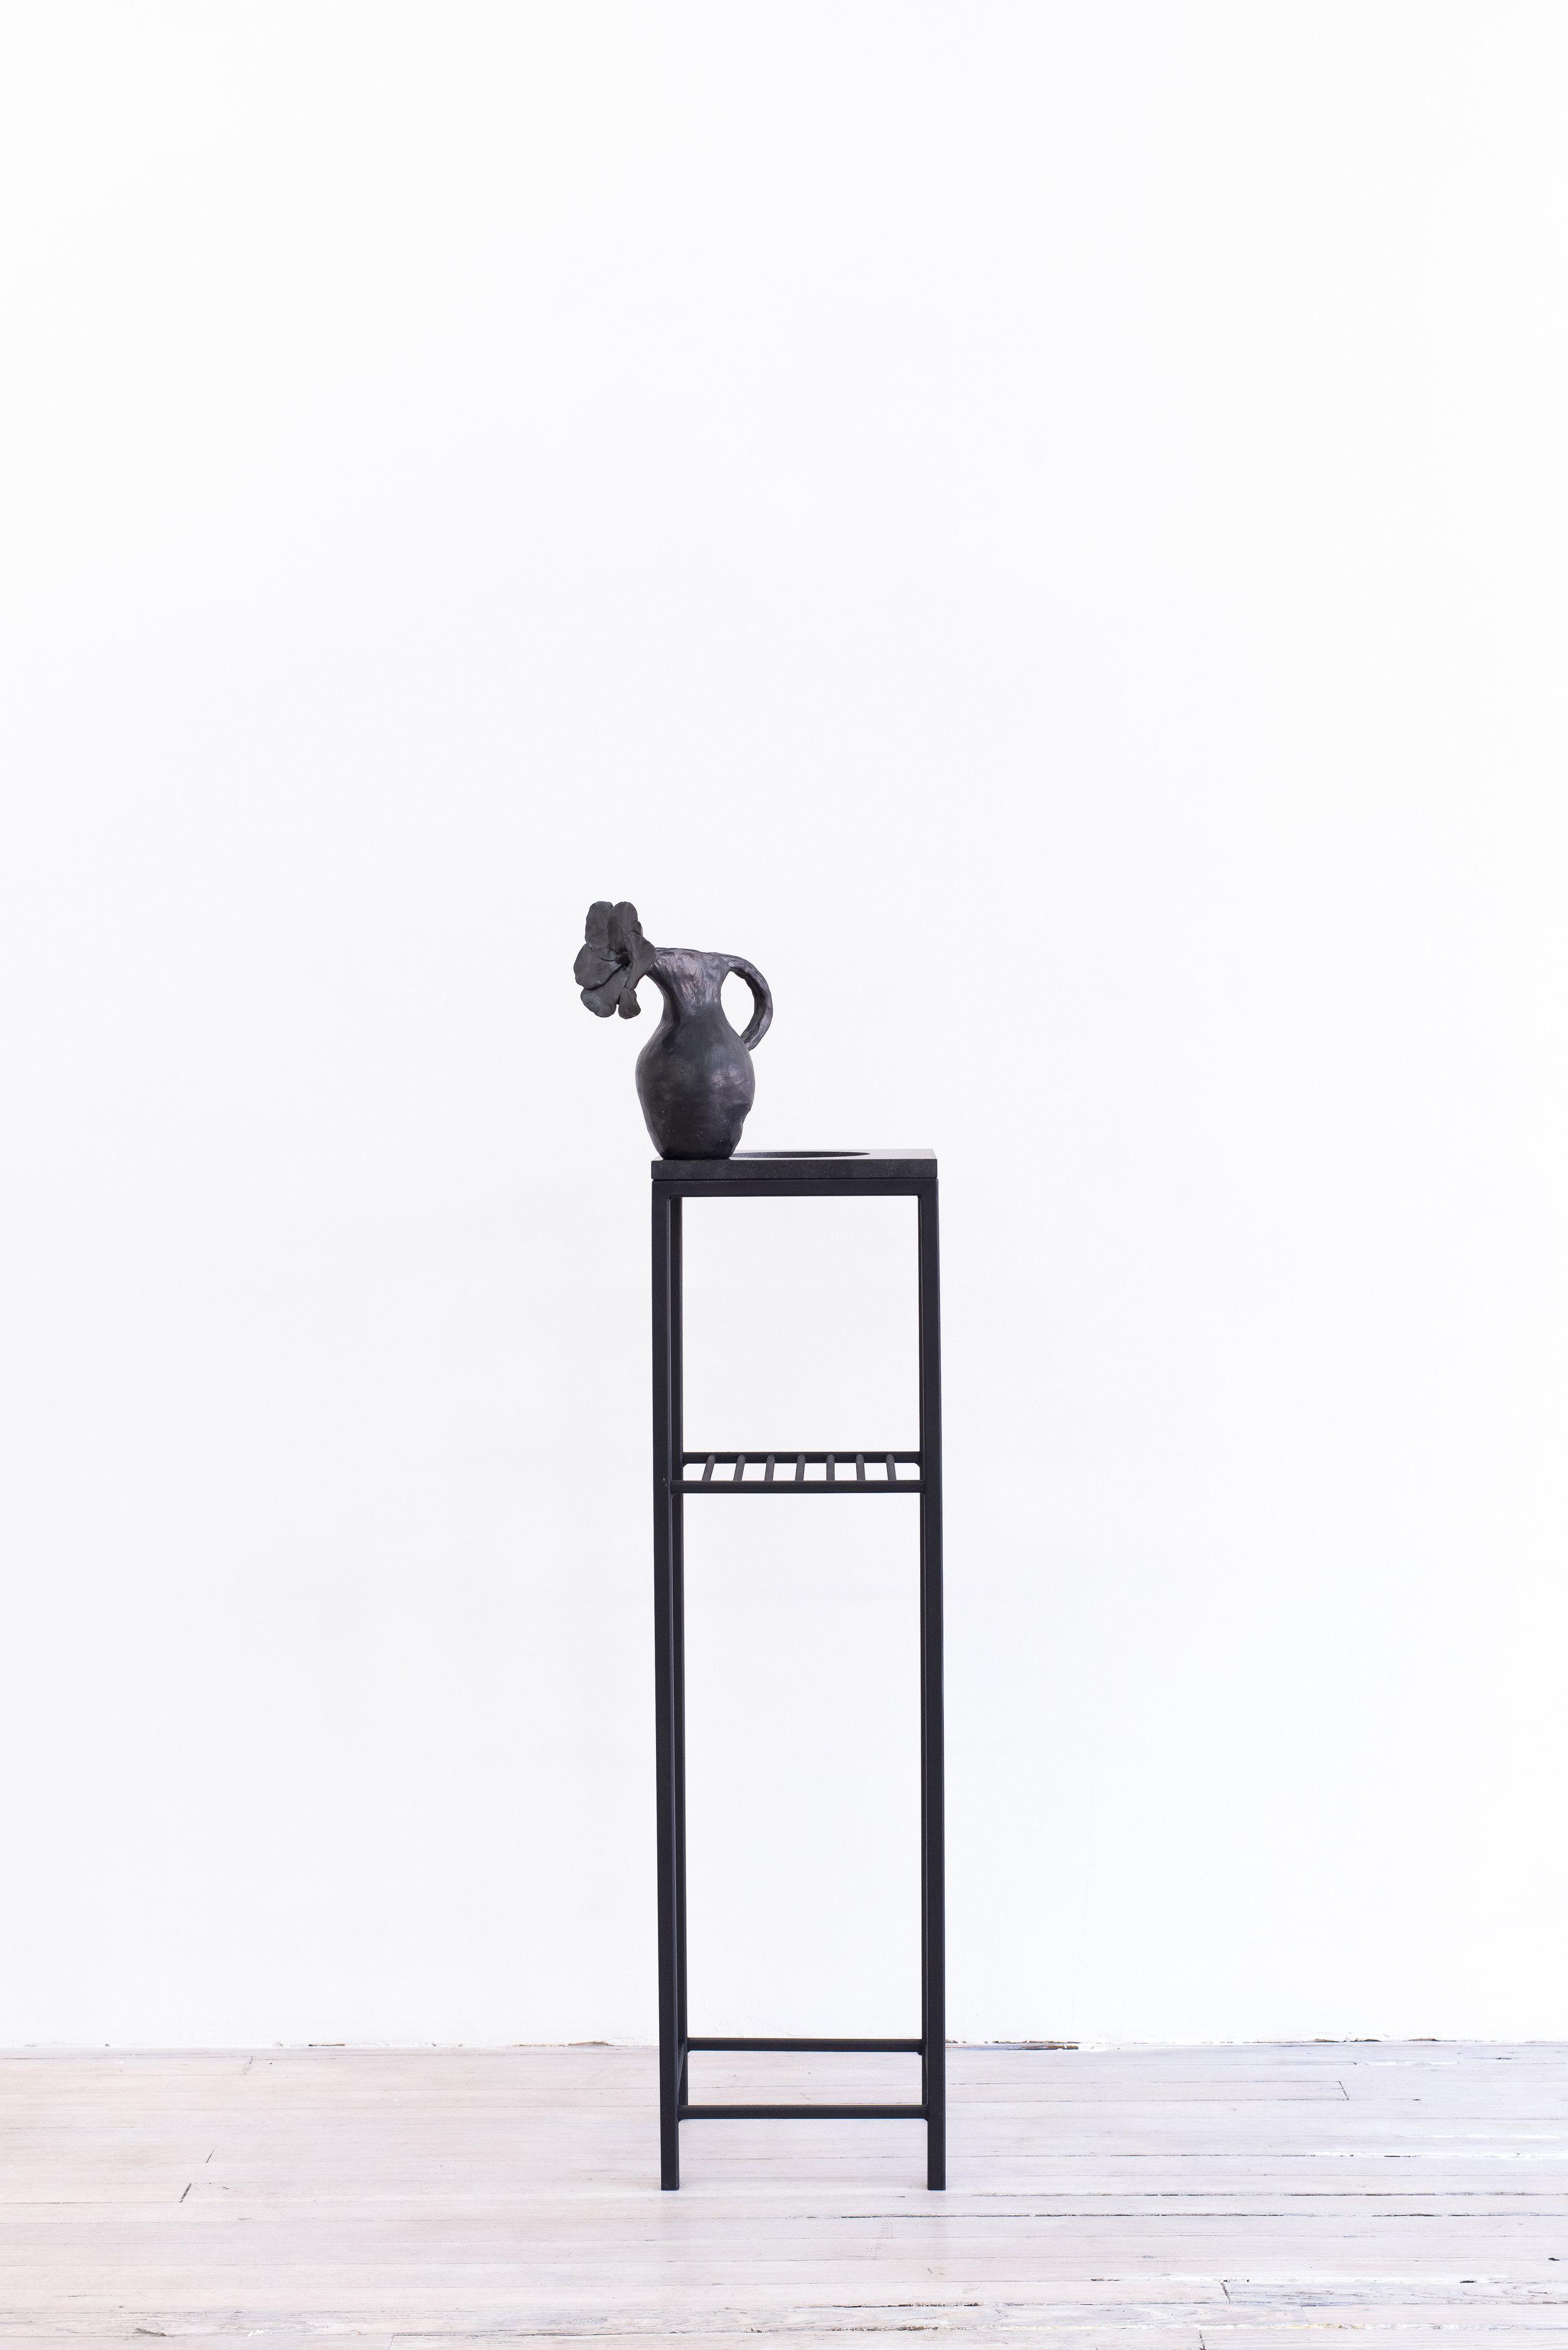 Elizabeth Jaeger   Untitled , 2016 Ceramic, vase 9.5 x 11.25 x 5.5 inches, pedestal: 49.5 x 12 x 10 inches